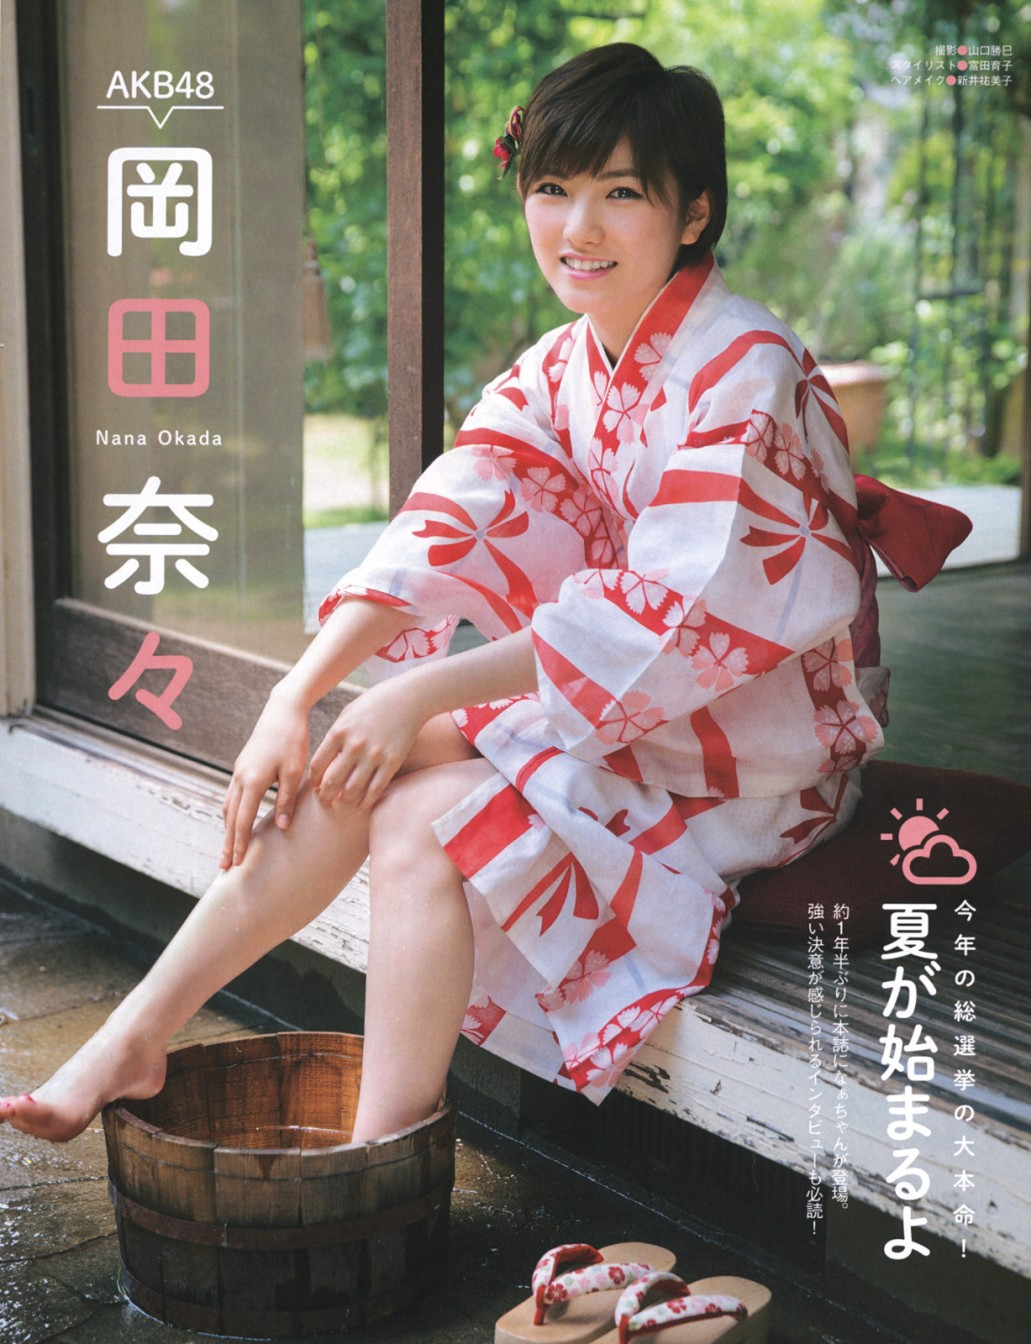 Okada Nana 岡田奈々 AKB48, EX-Taishu 2016.07 Gravure